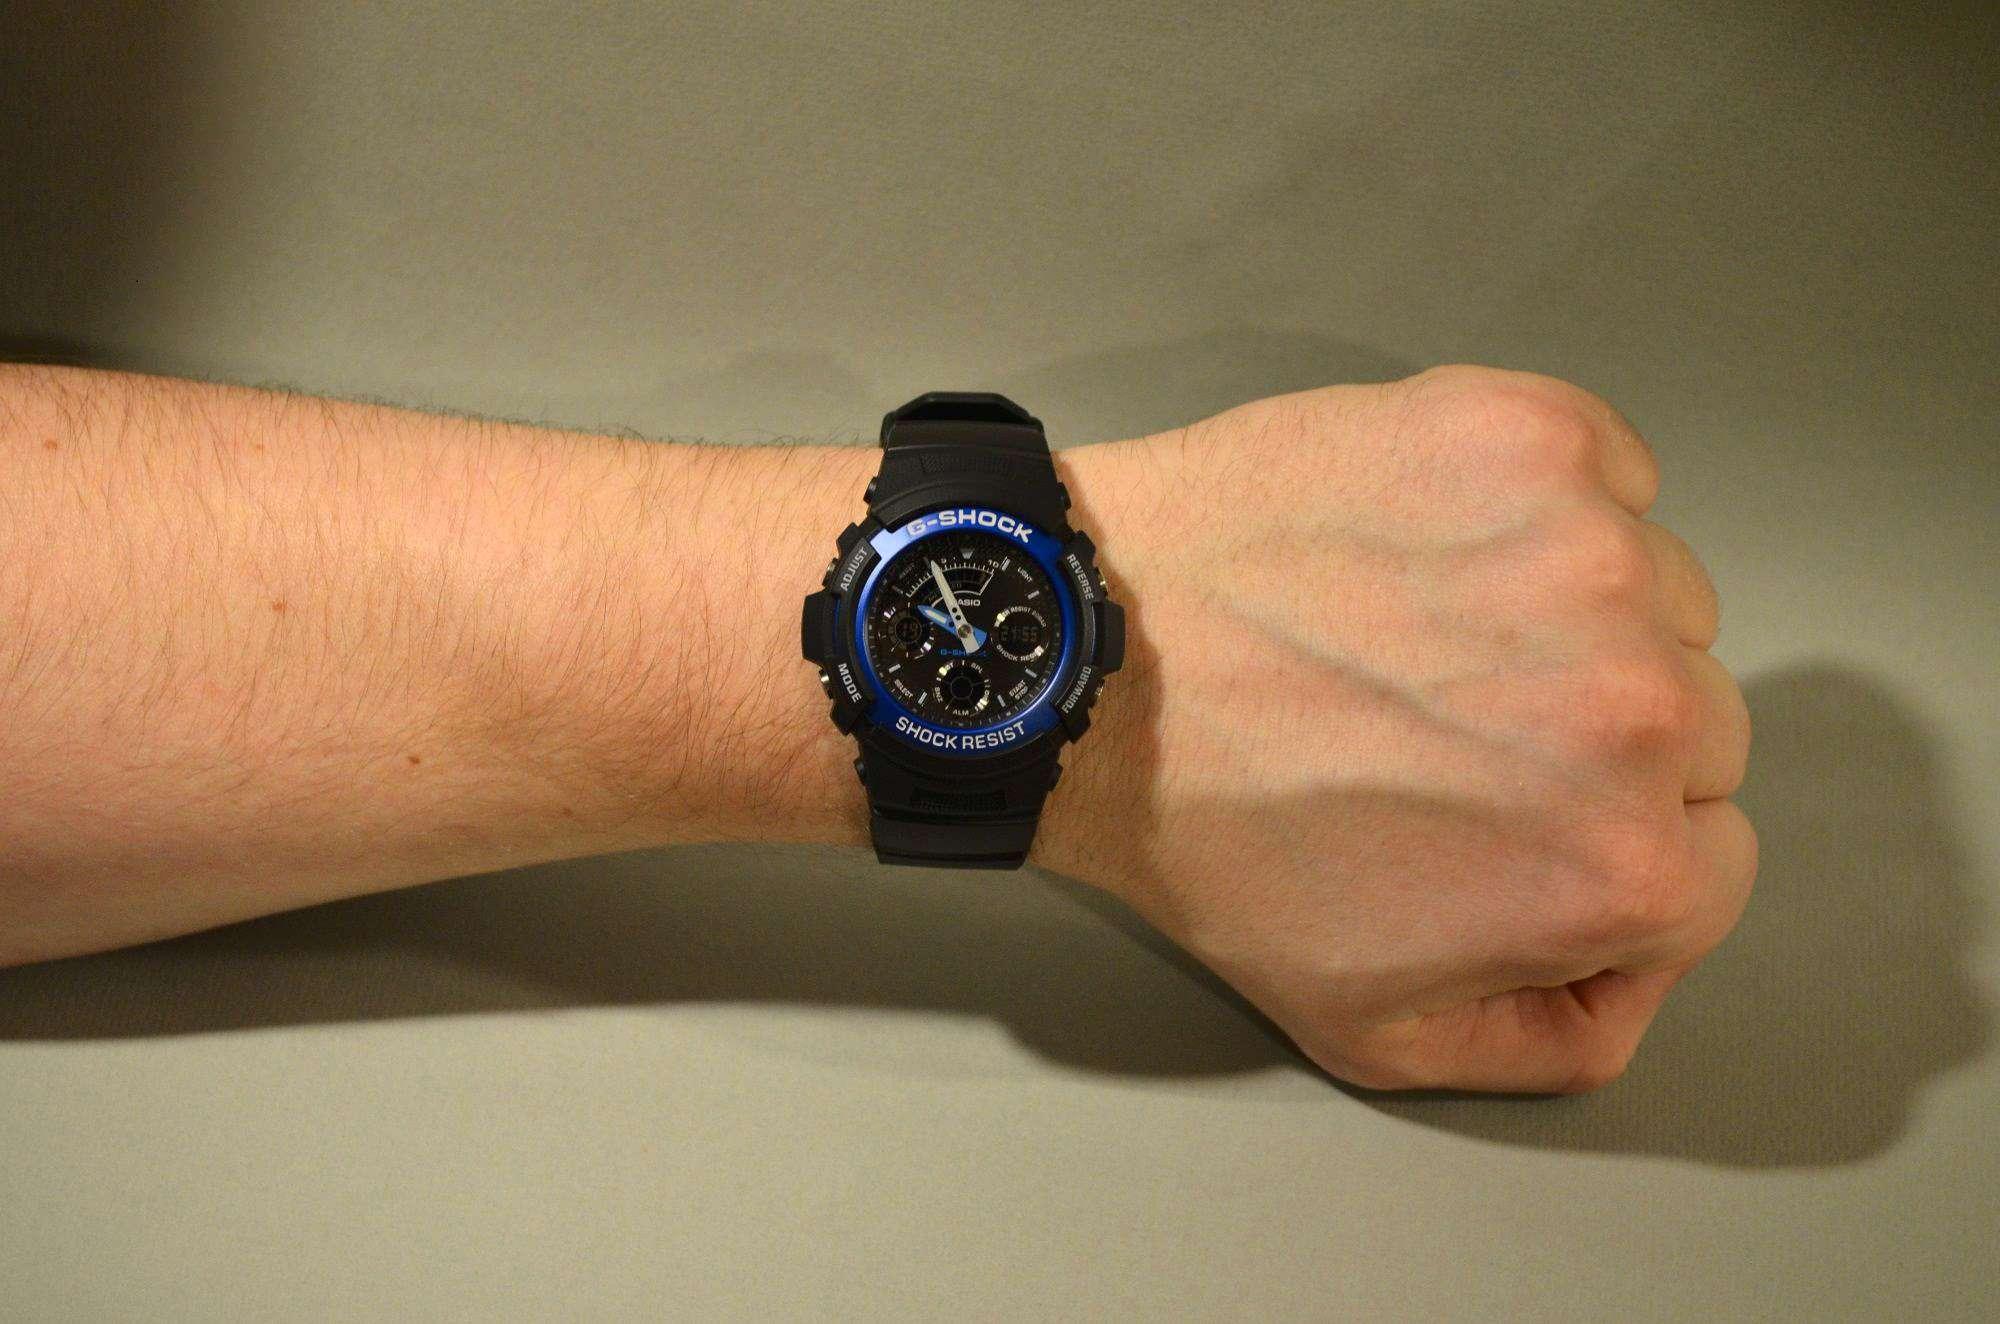 fb592dbddcc8 Наручные часы CASIO AW-591-2A